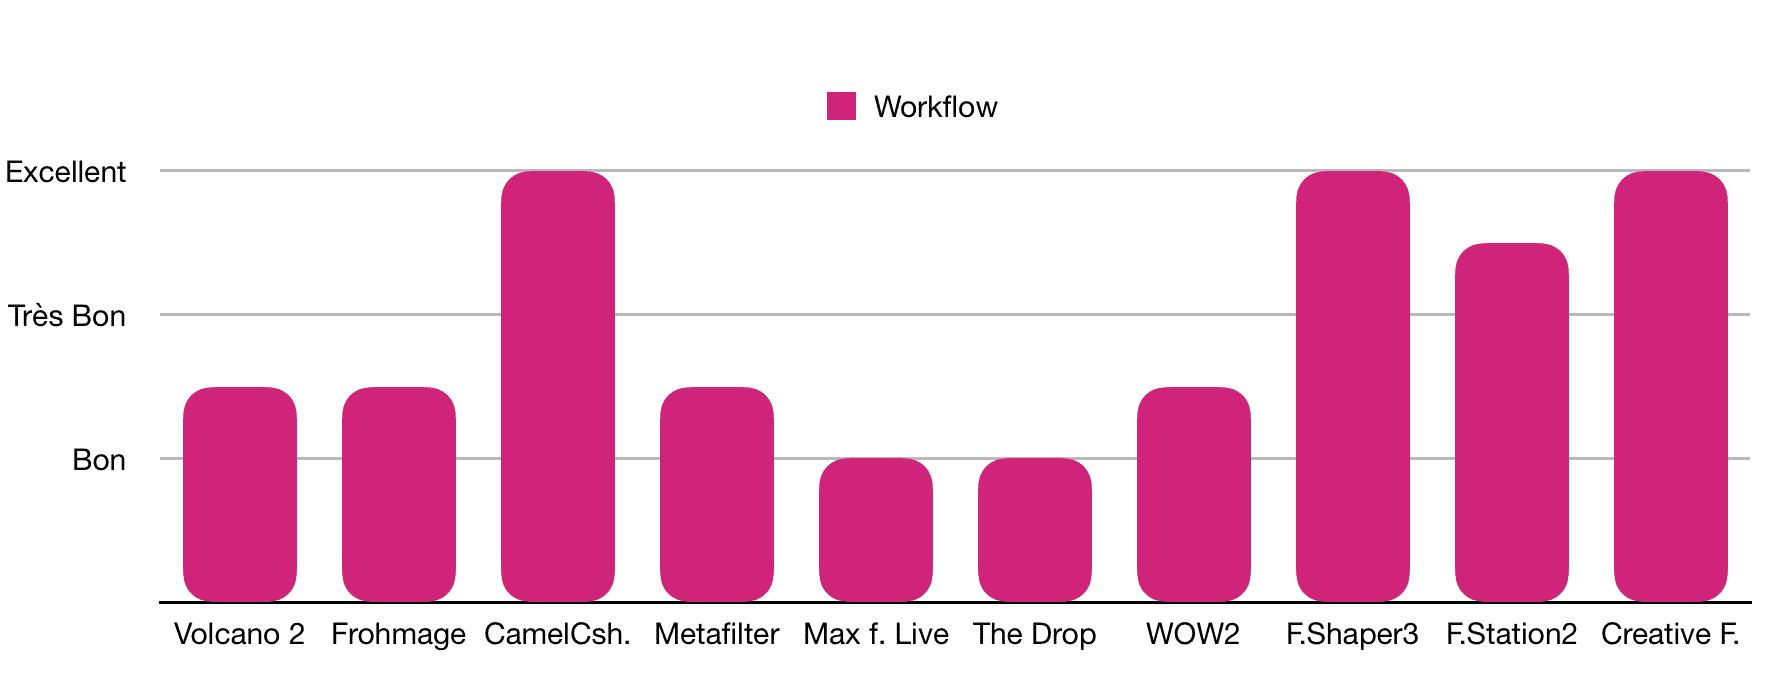 Workflow - TOP 10 - Plugins - Compresseurs - WE COMPOZE